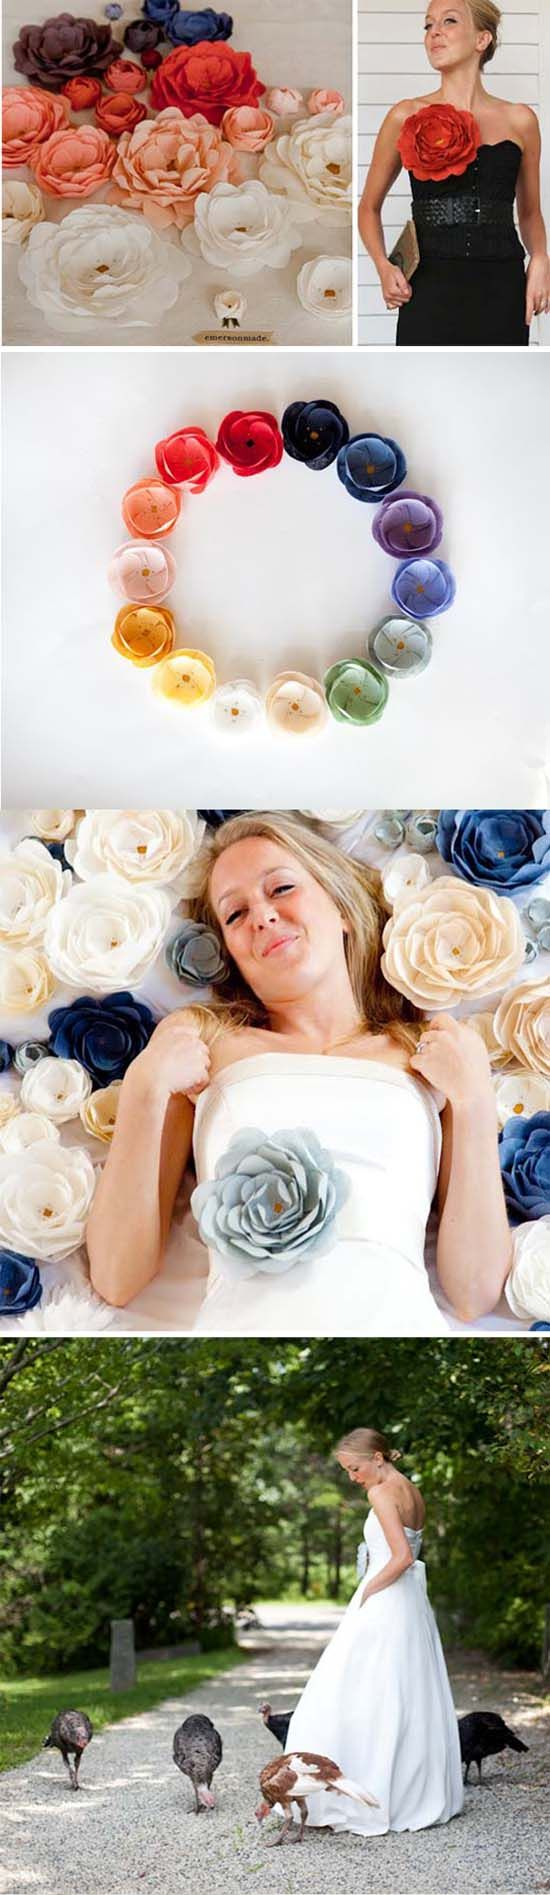 love these emerson made flowersDiy Ideas, Flowers Crafts, Fabrics Flower, Handmade Flower, Crafty Lady, Diy Flower, Flower Mania, Diy Crafty, Creative Inspiration